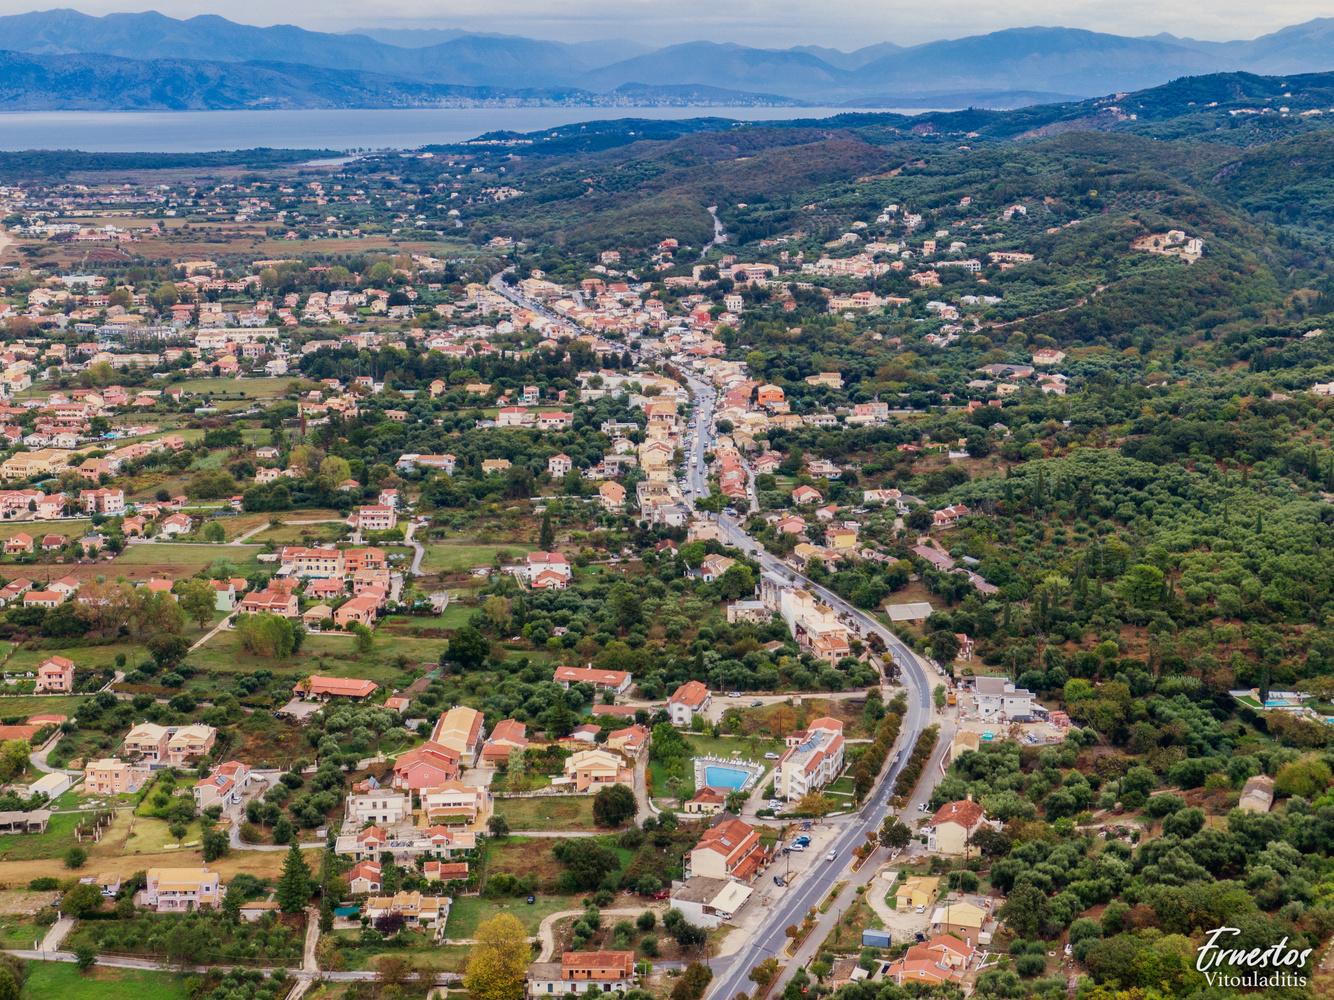 Acharavi Corfu Aerial view by ernestos vitouladitis